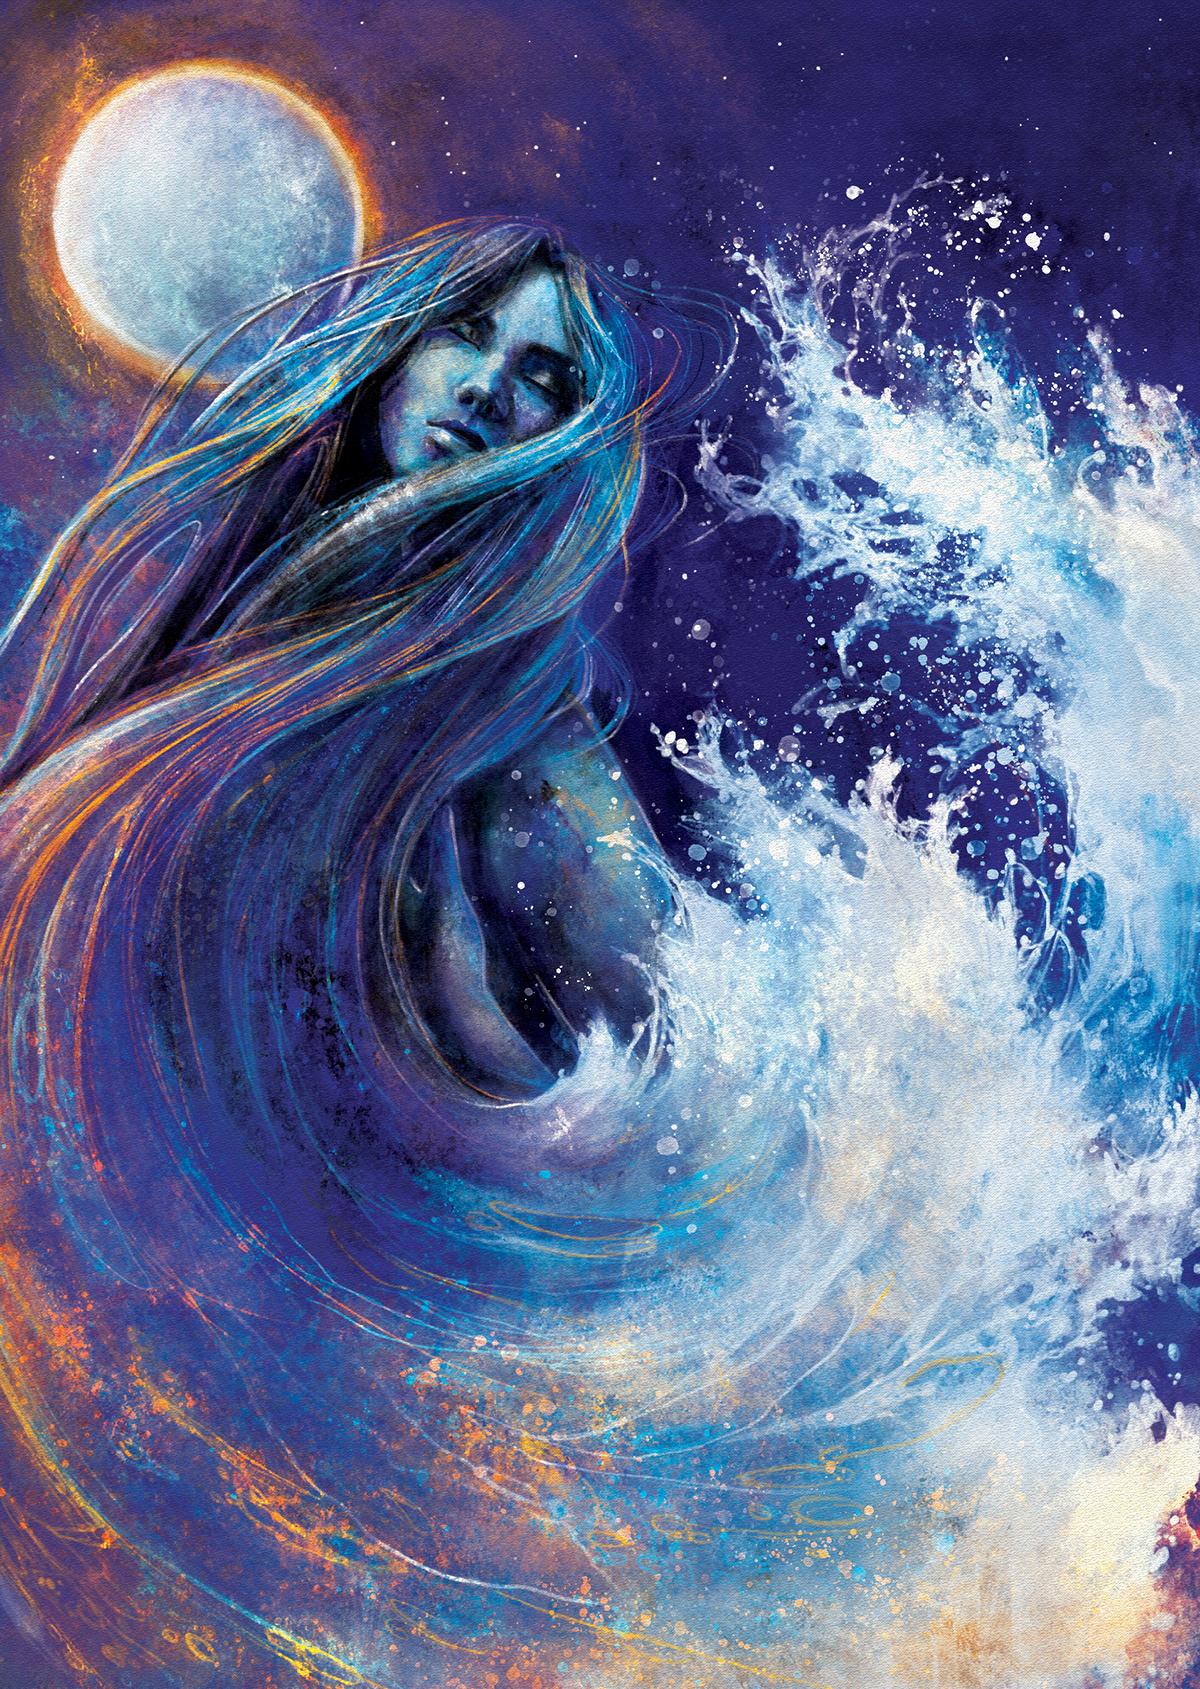 Adobe Photoshop book illustration digital painting fantasy ILLUSTRATION  Love poems romance woman atmosphere emotion metaphor people waves